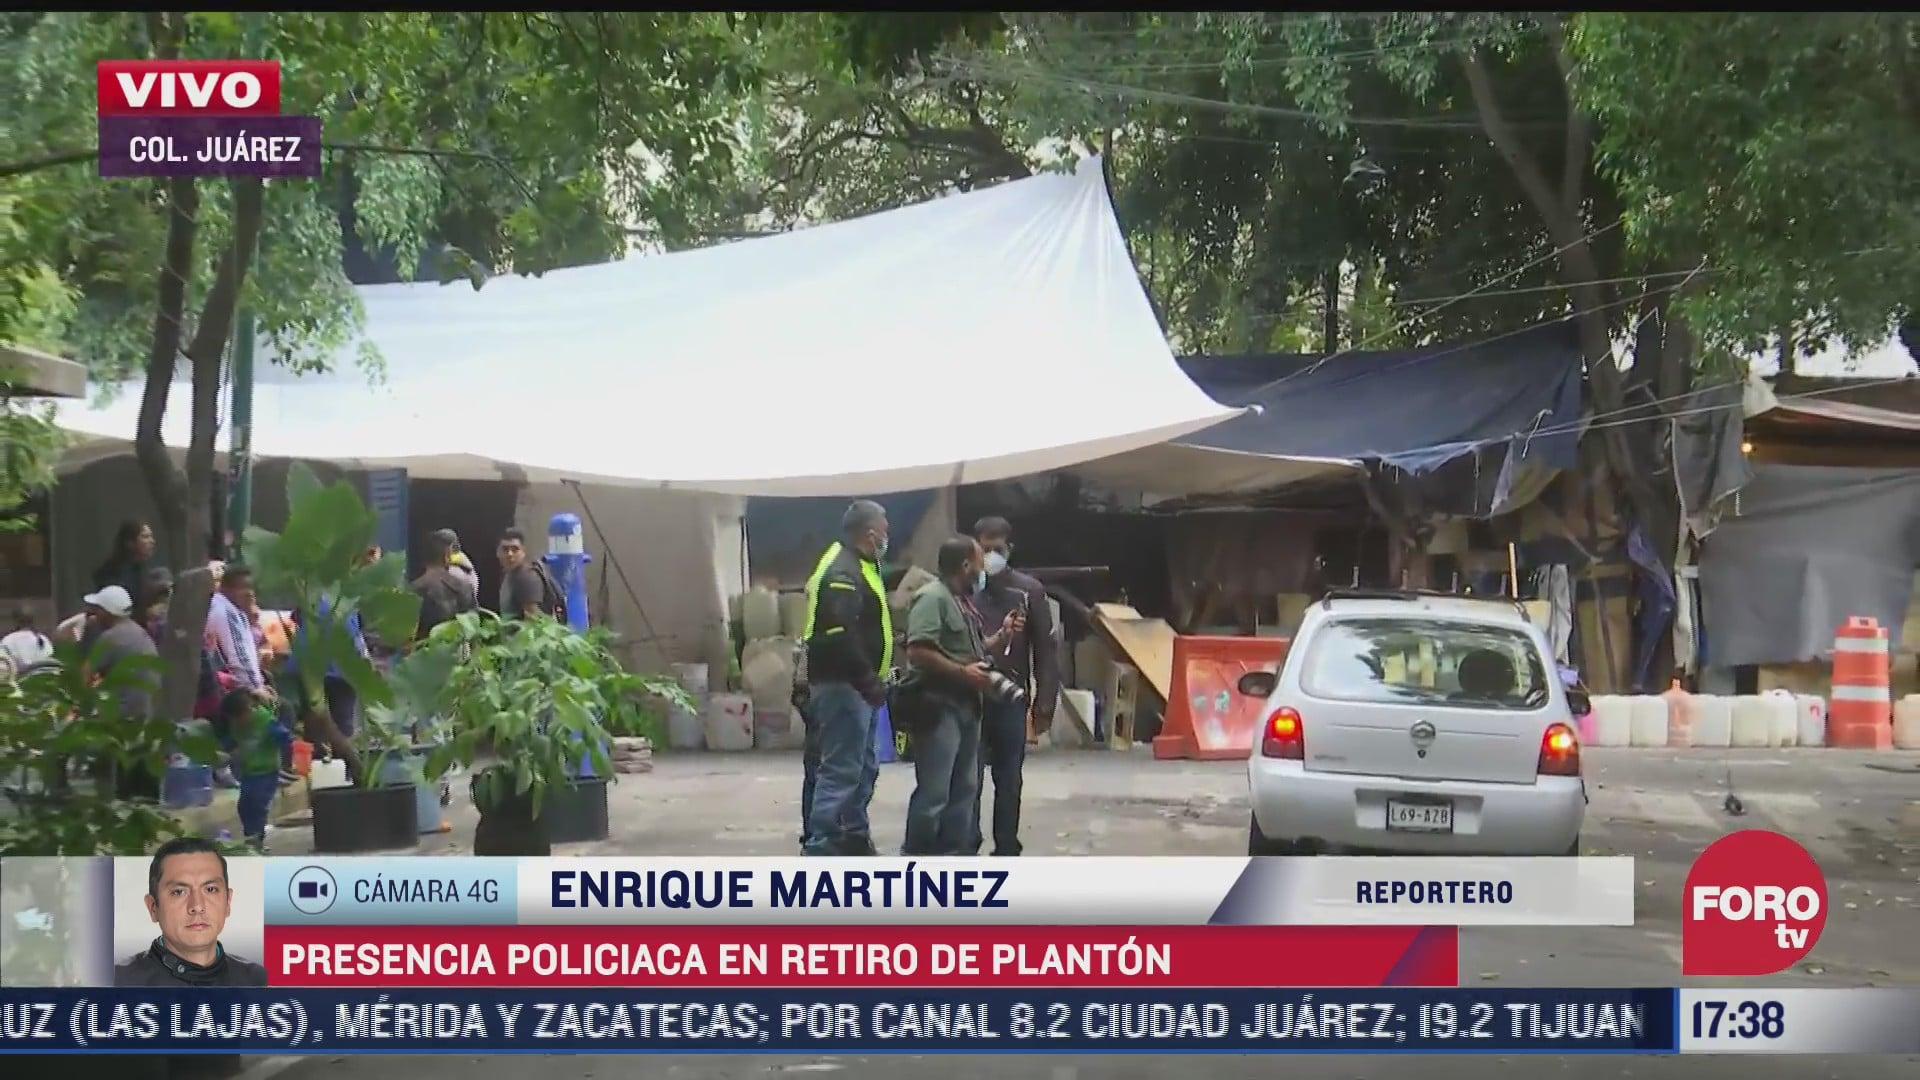 presencia policiaca en retiro de planton en colonia juarez cdmx